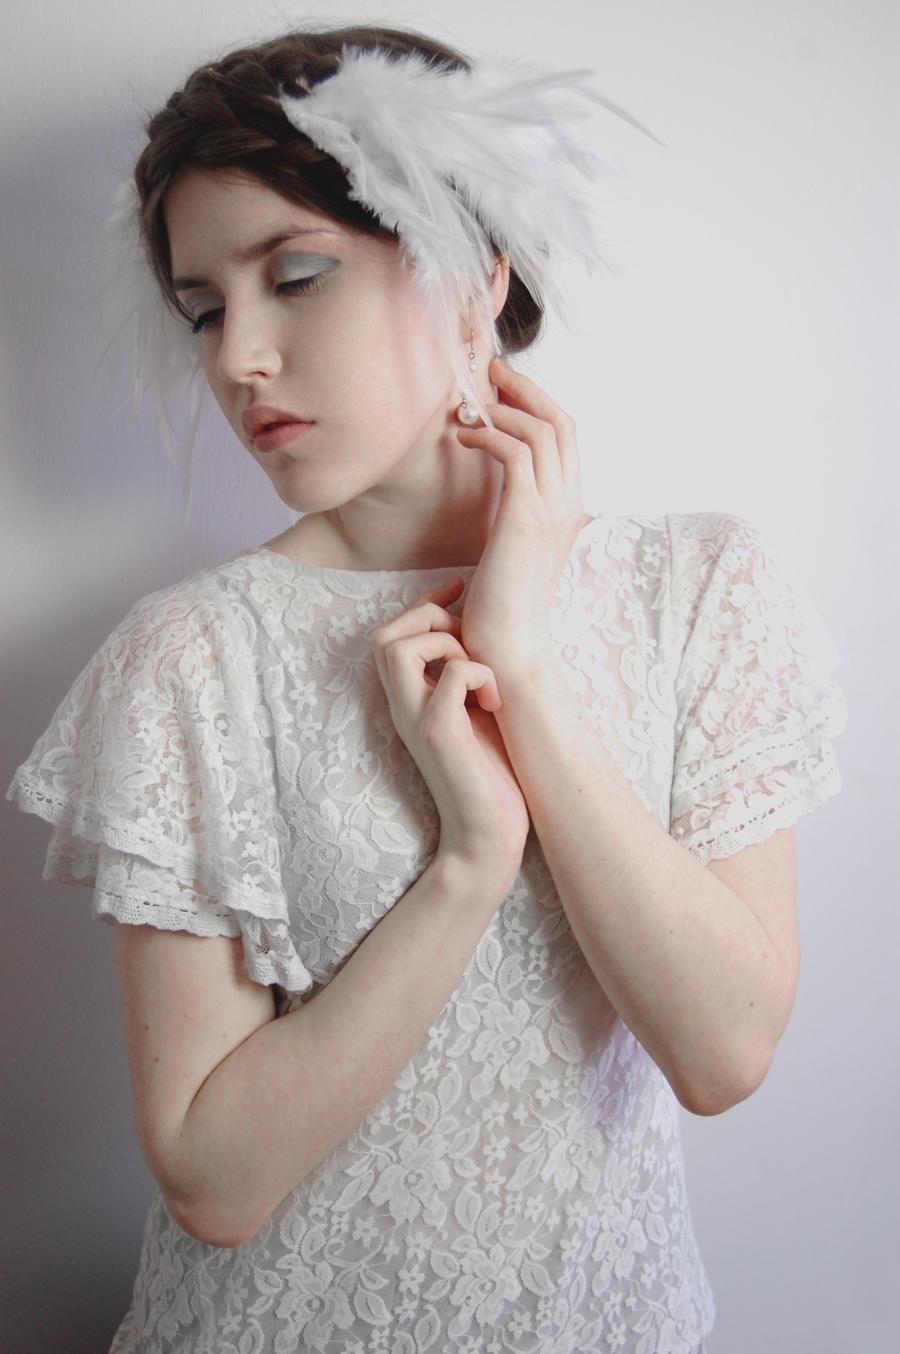 White Swan 13 by Kechake-stock